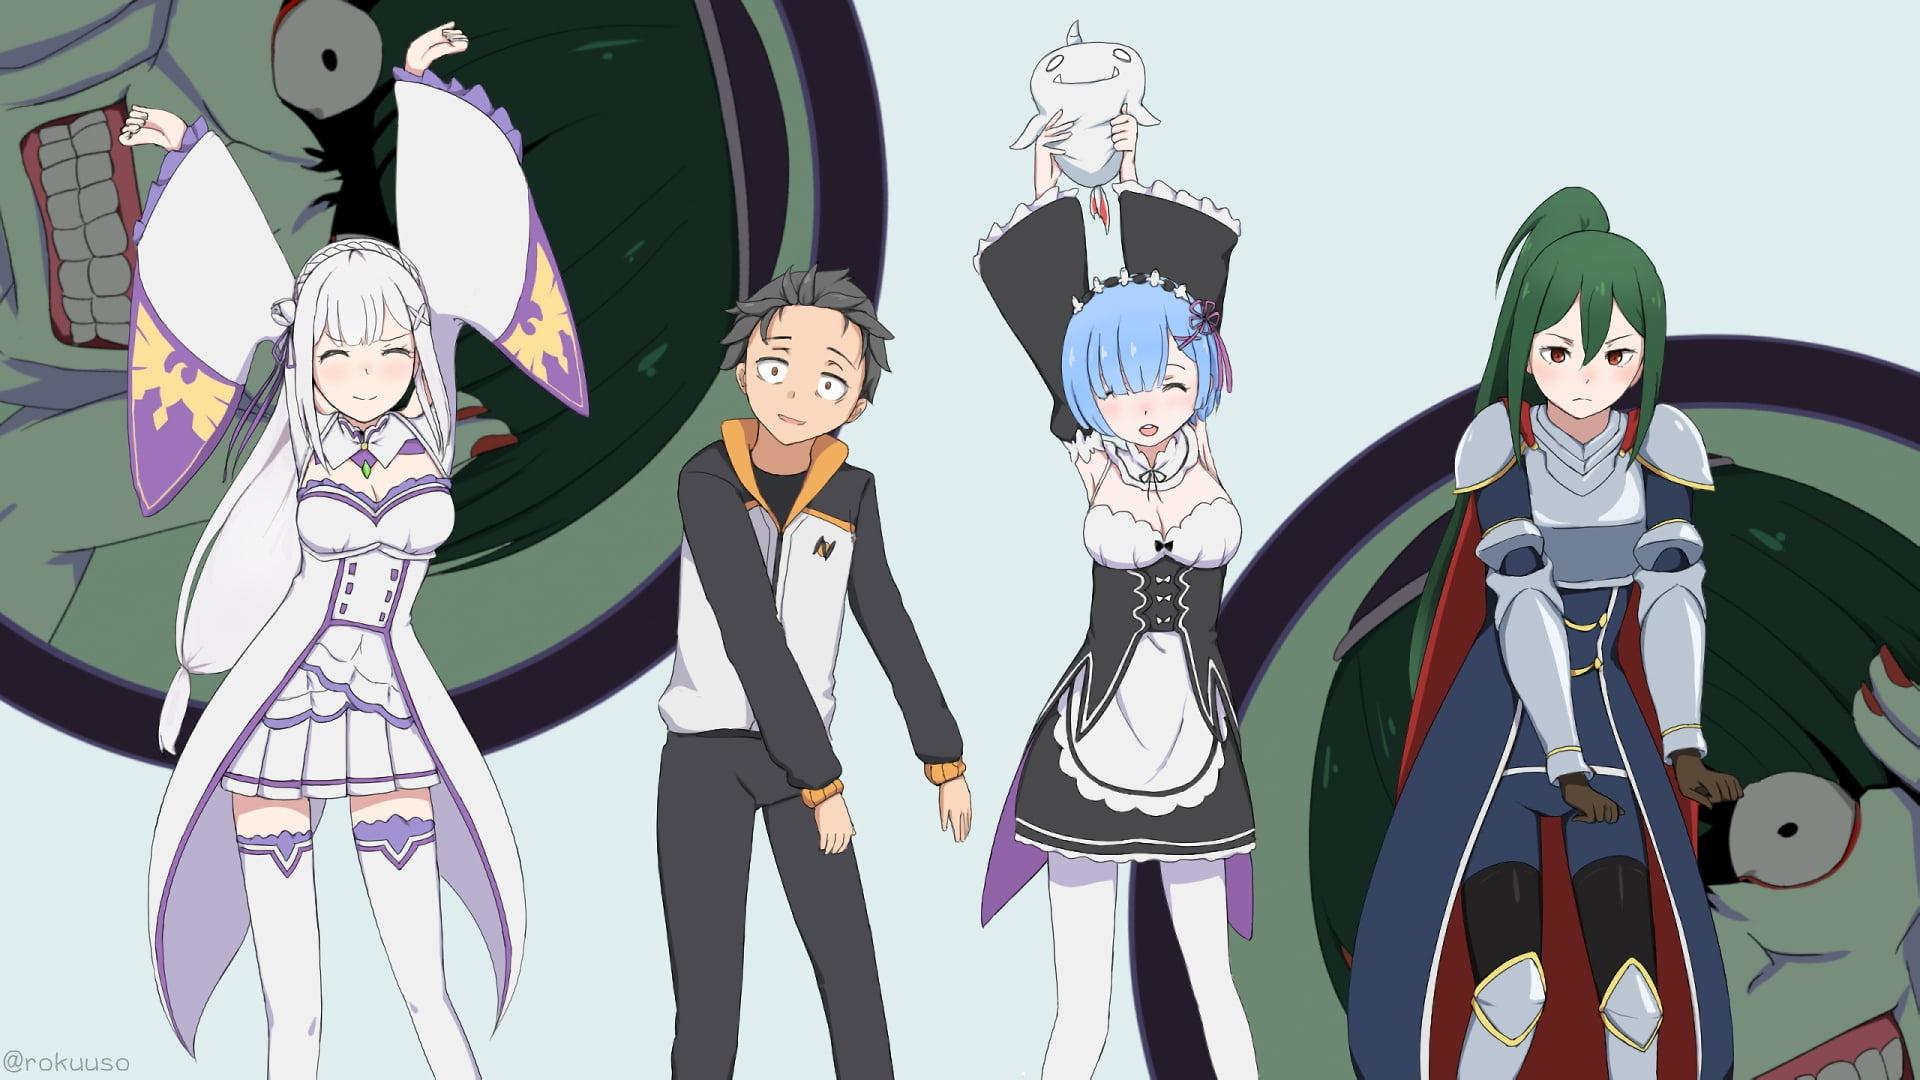 Anime Characters Wall Paper Rezero Kara Hajimeru Isekai .jpg laptop wallpaper